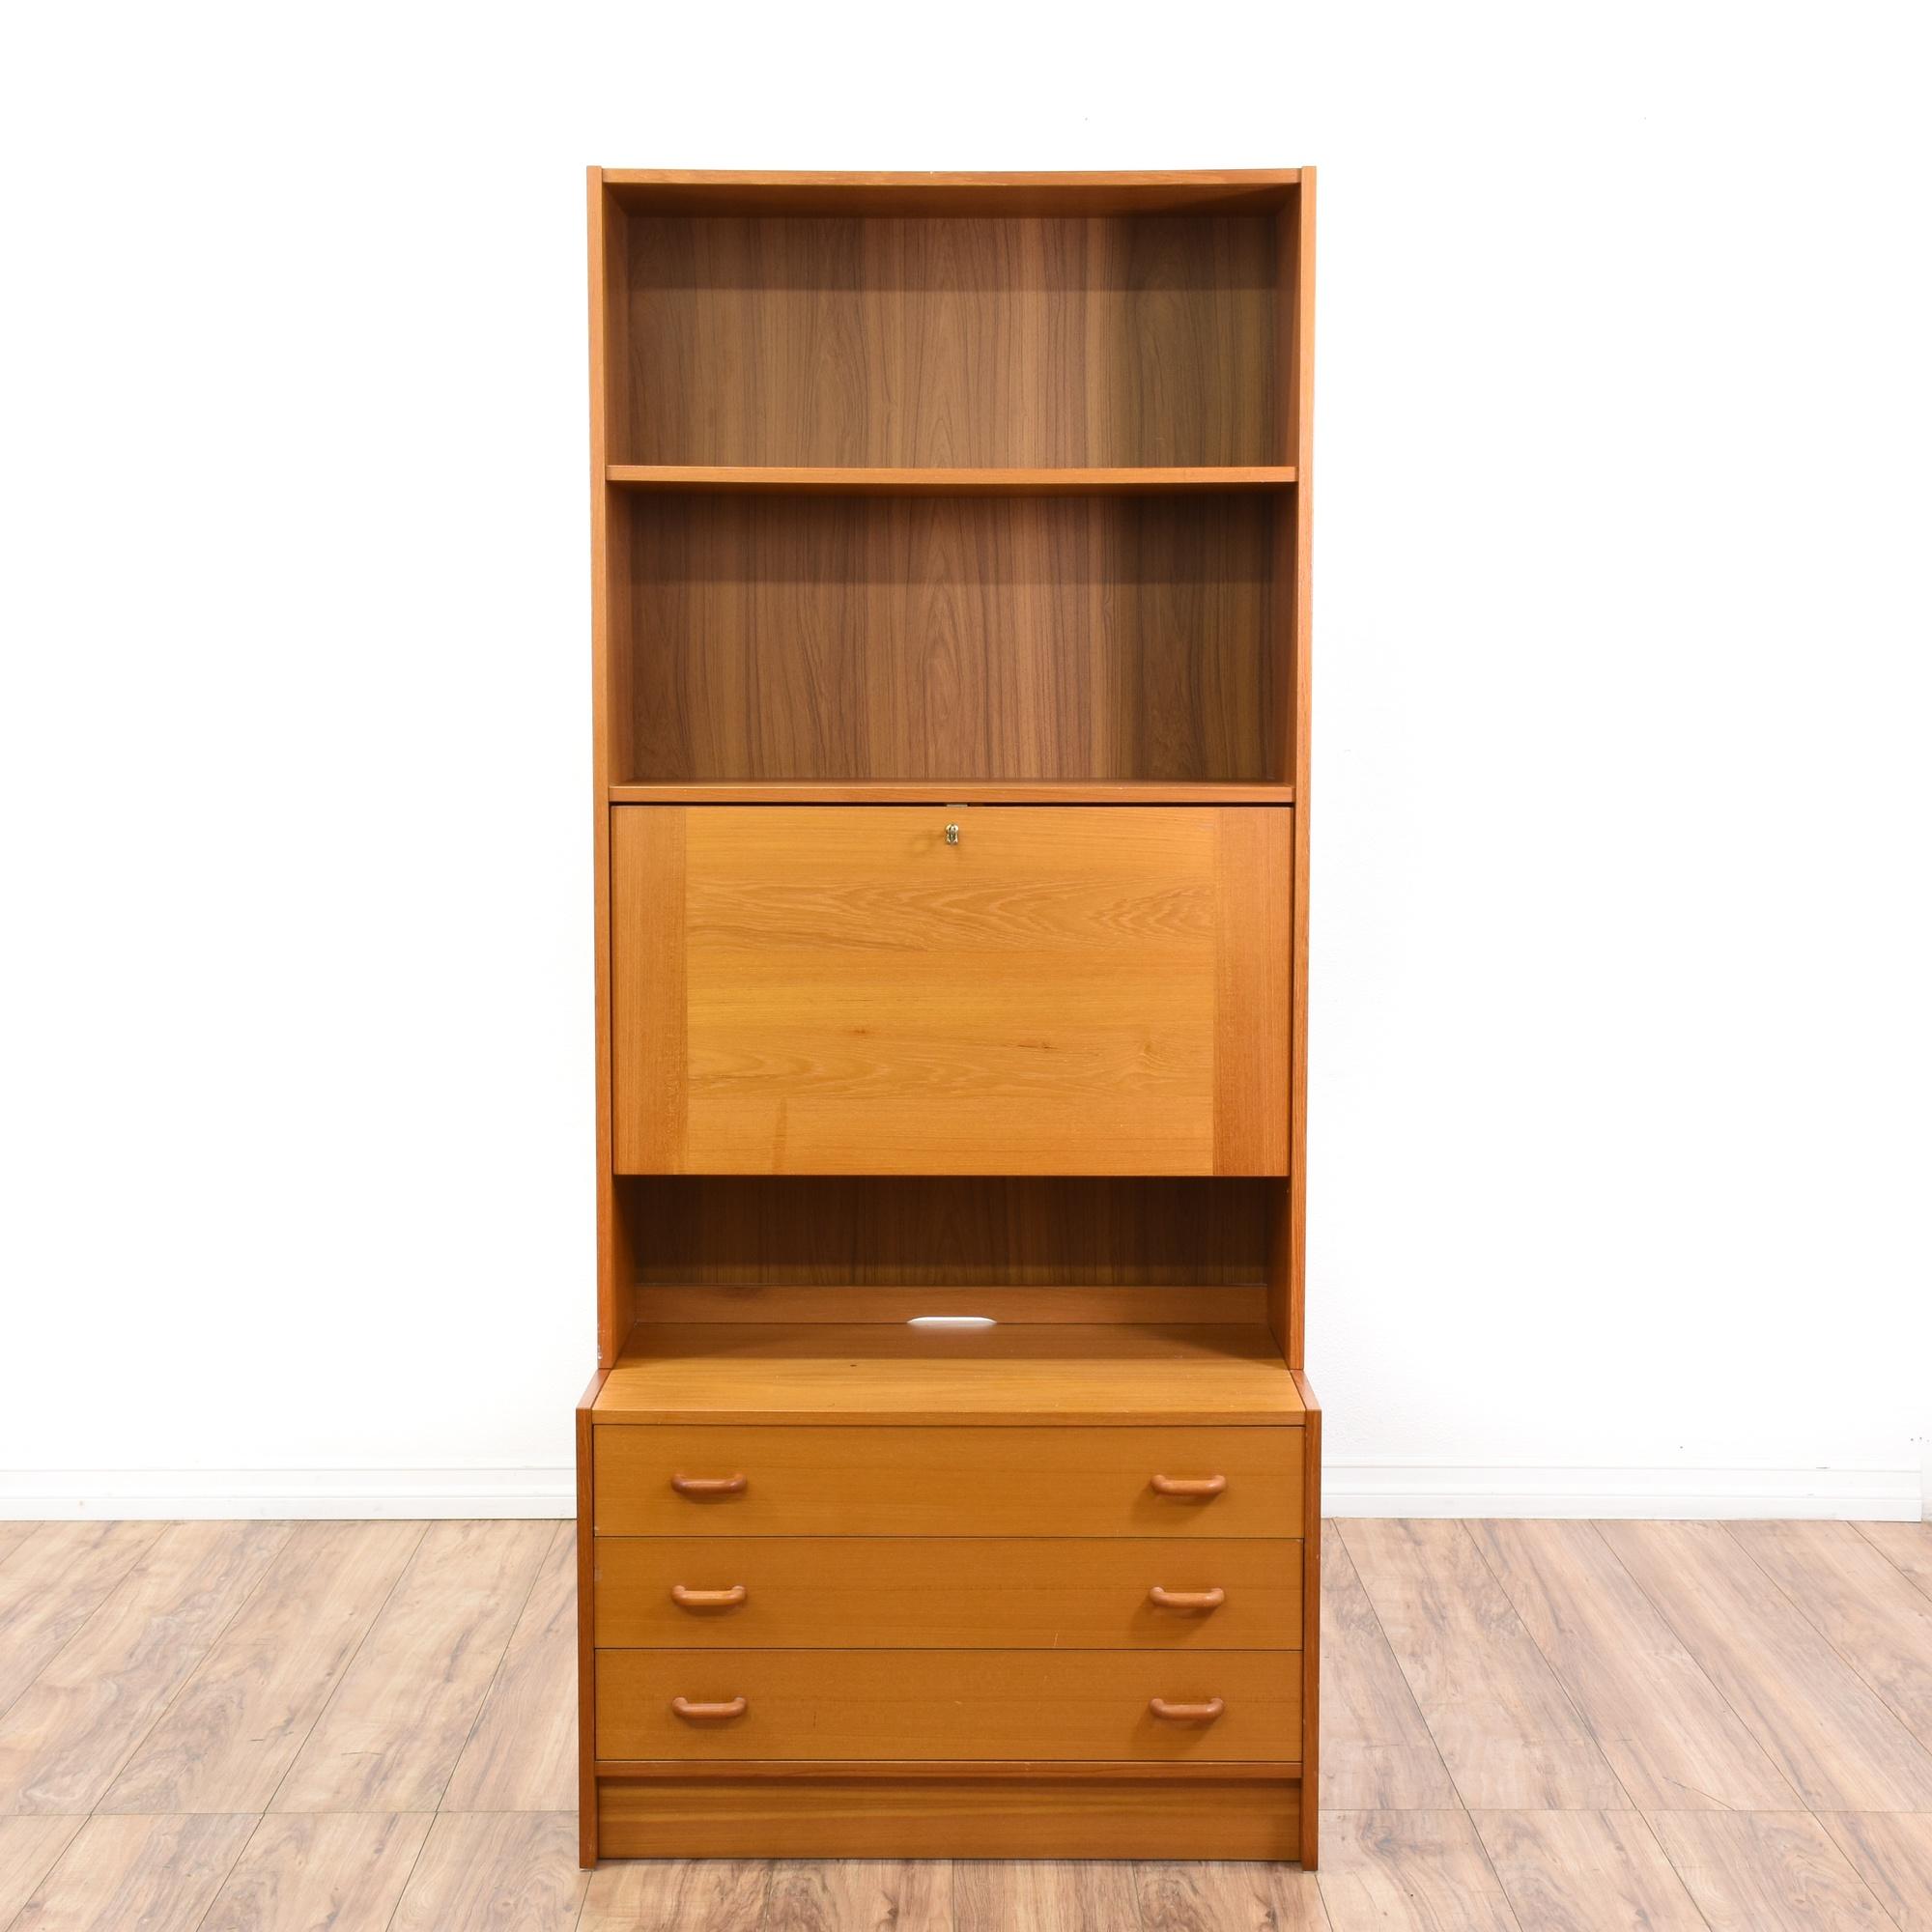 harmonic corner bookcase bookcases for modern vintage century champagne server heywood sale mid cabinet bookshelf wakefield danish